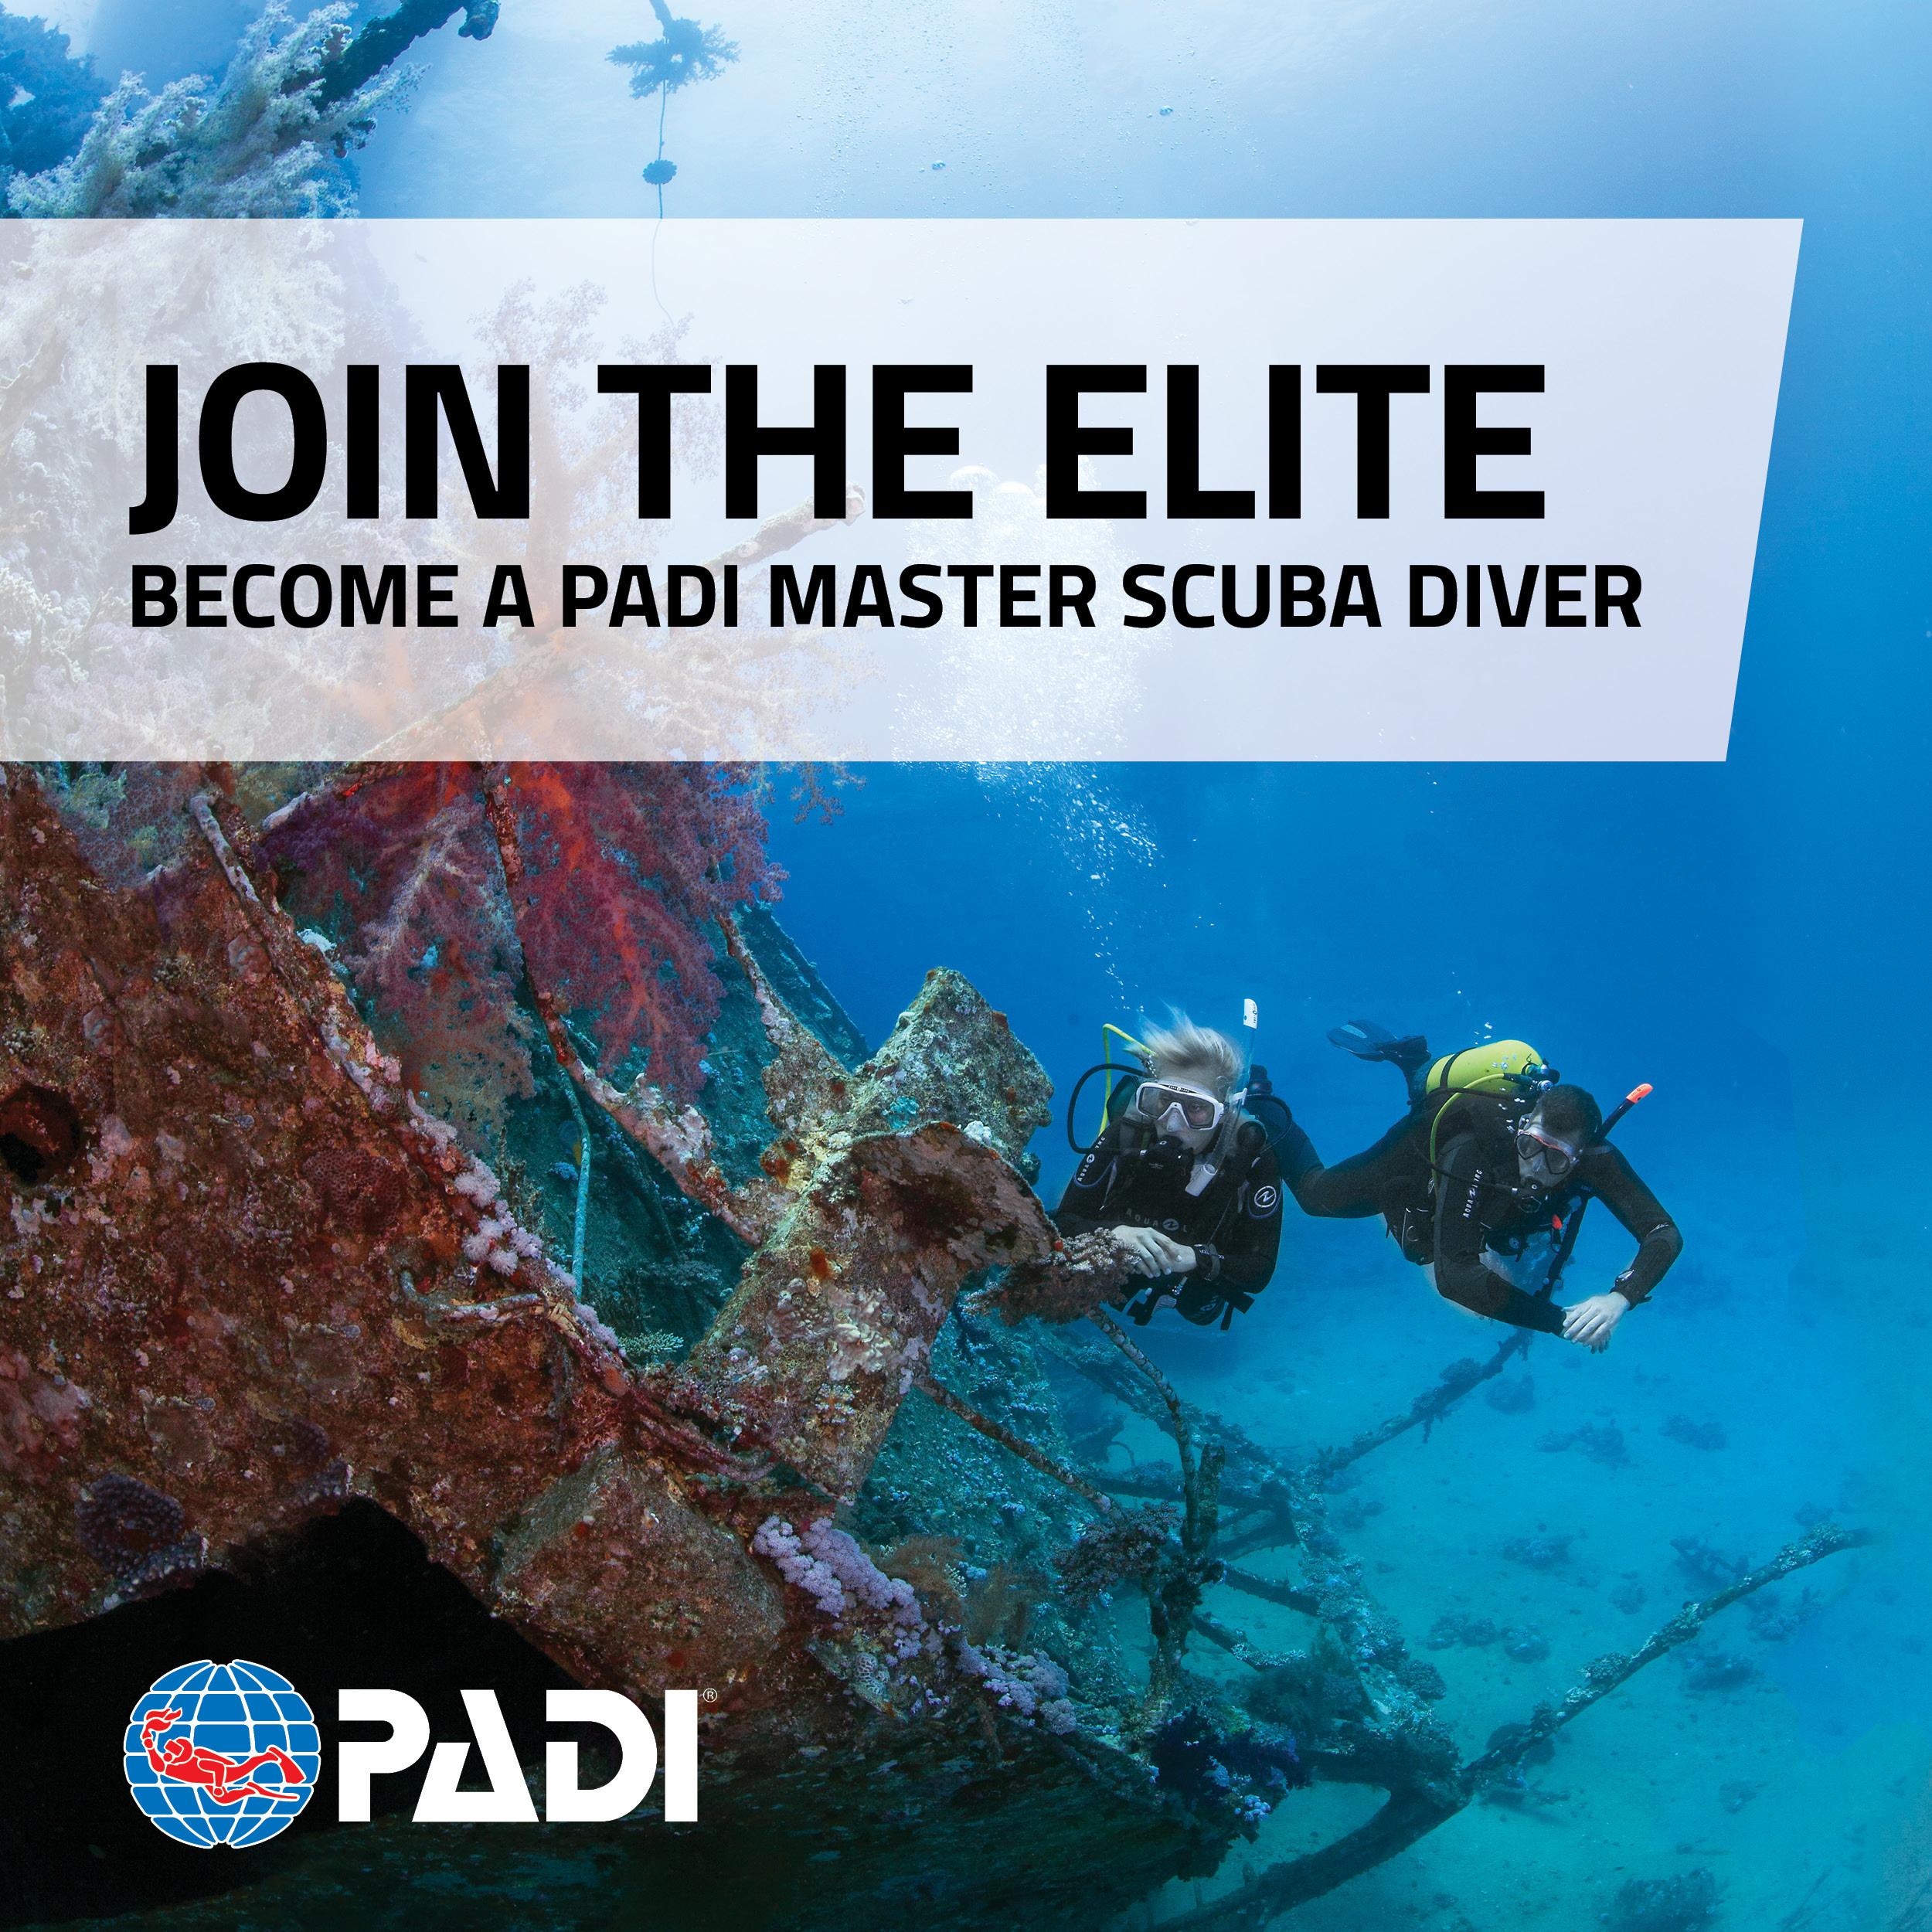 PADI - Master Scuba Diver